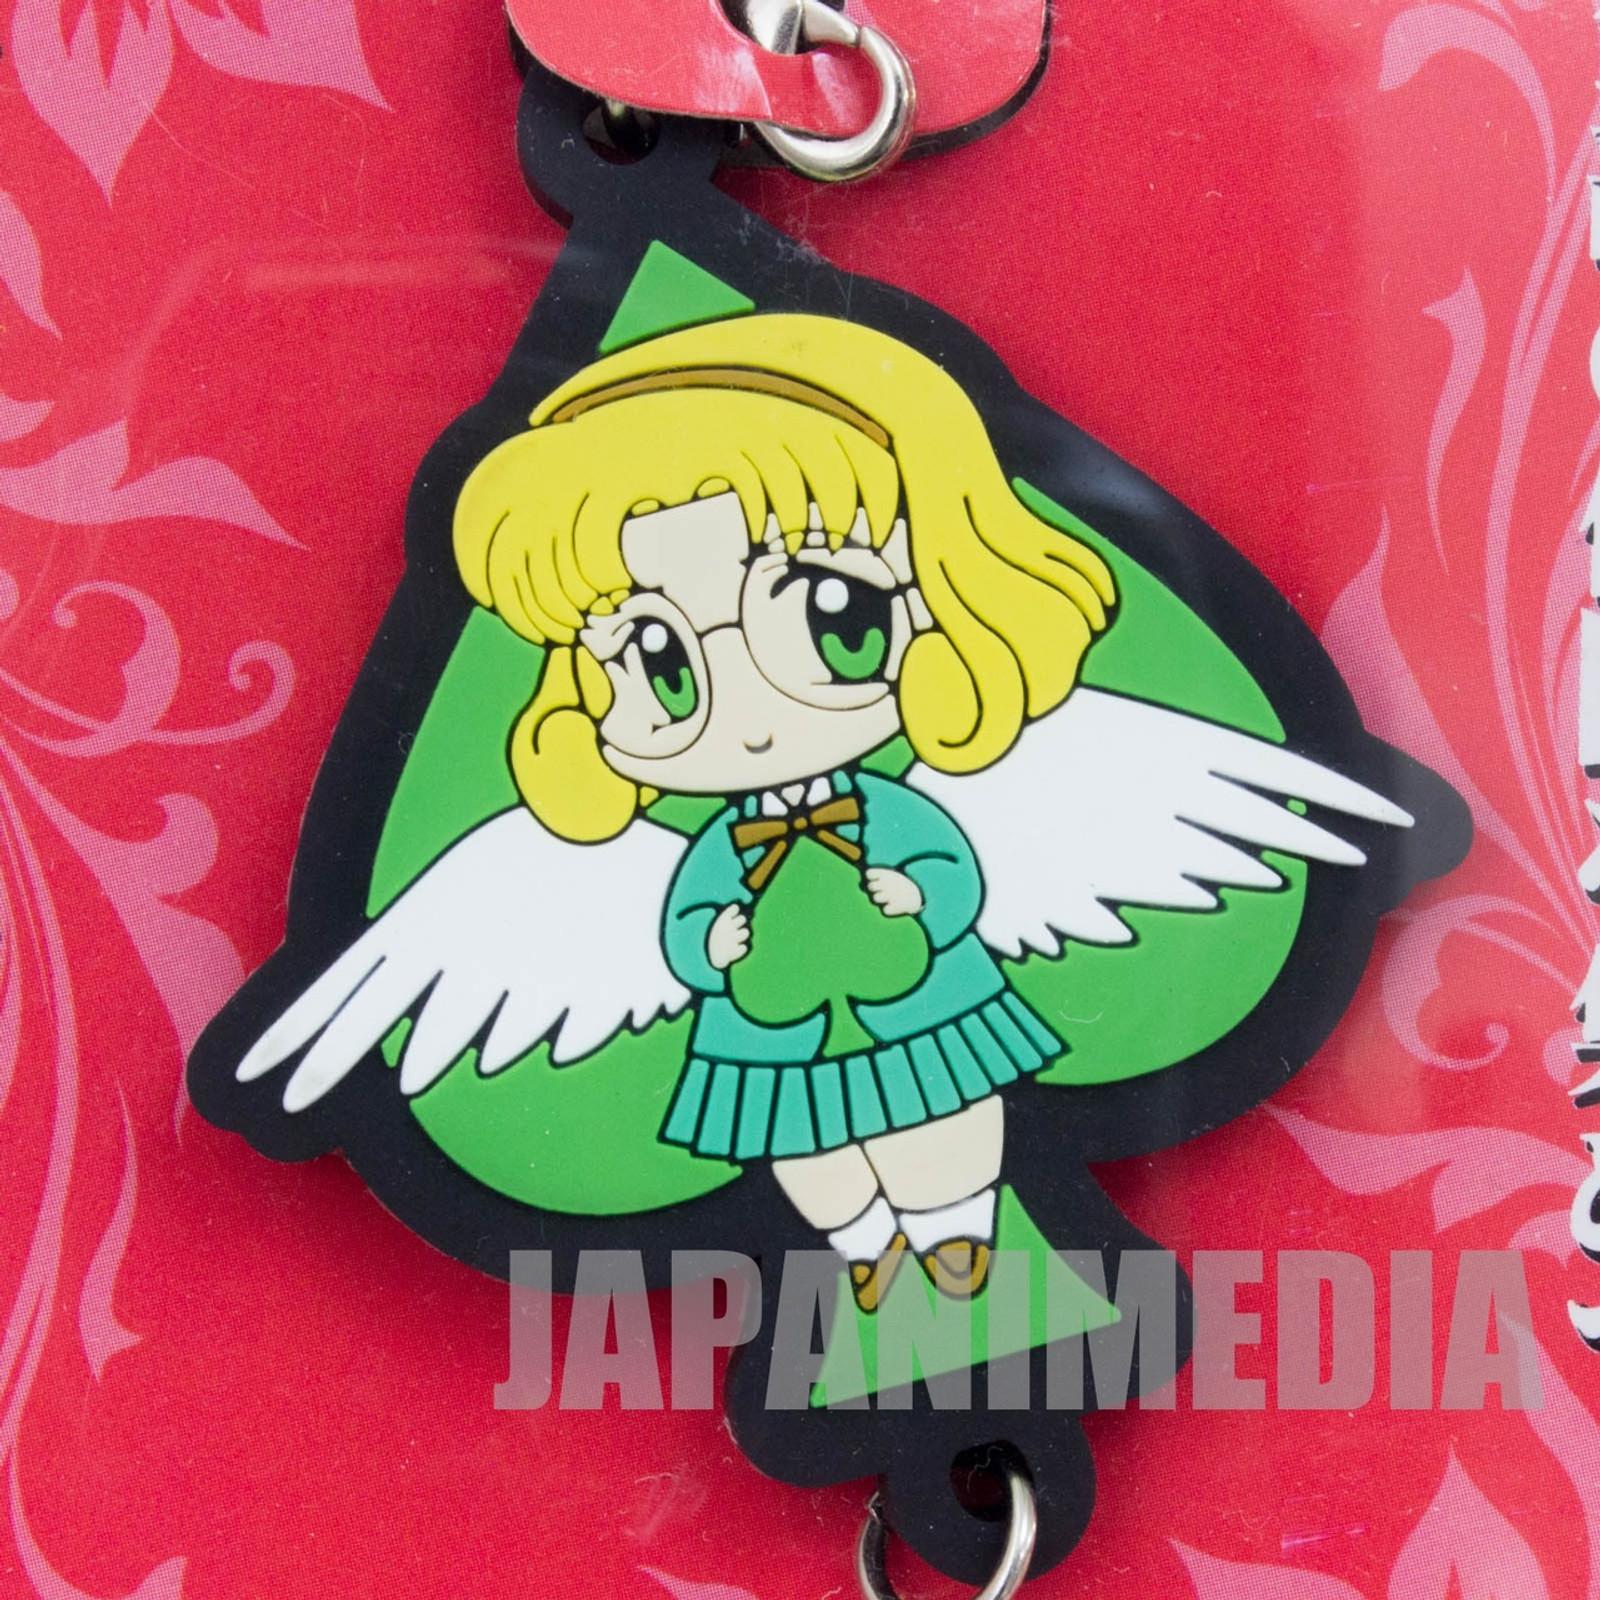 Magic Knight Rayearth Hououji Fu Mascot Rubber Strap CLAMP JAPAN ANIME